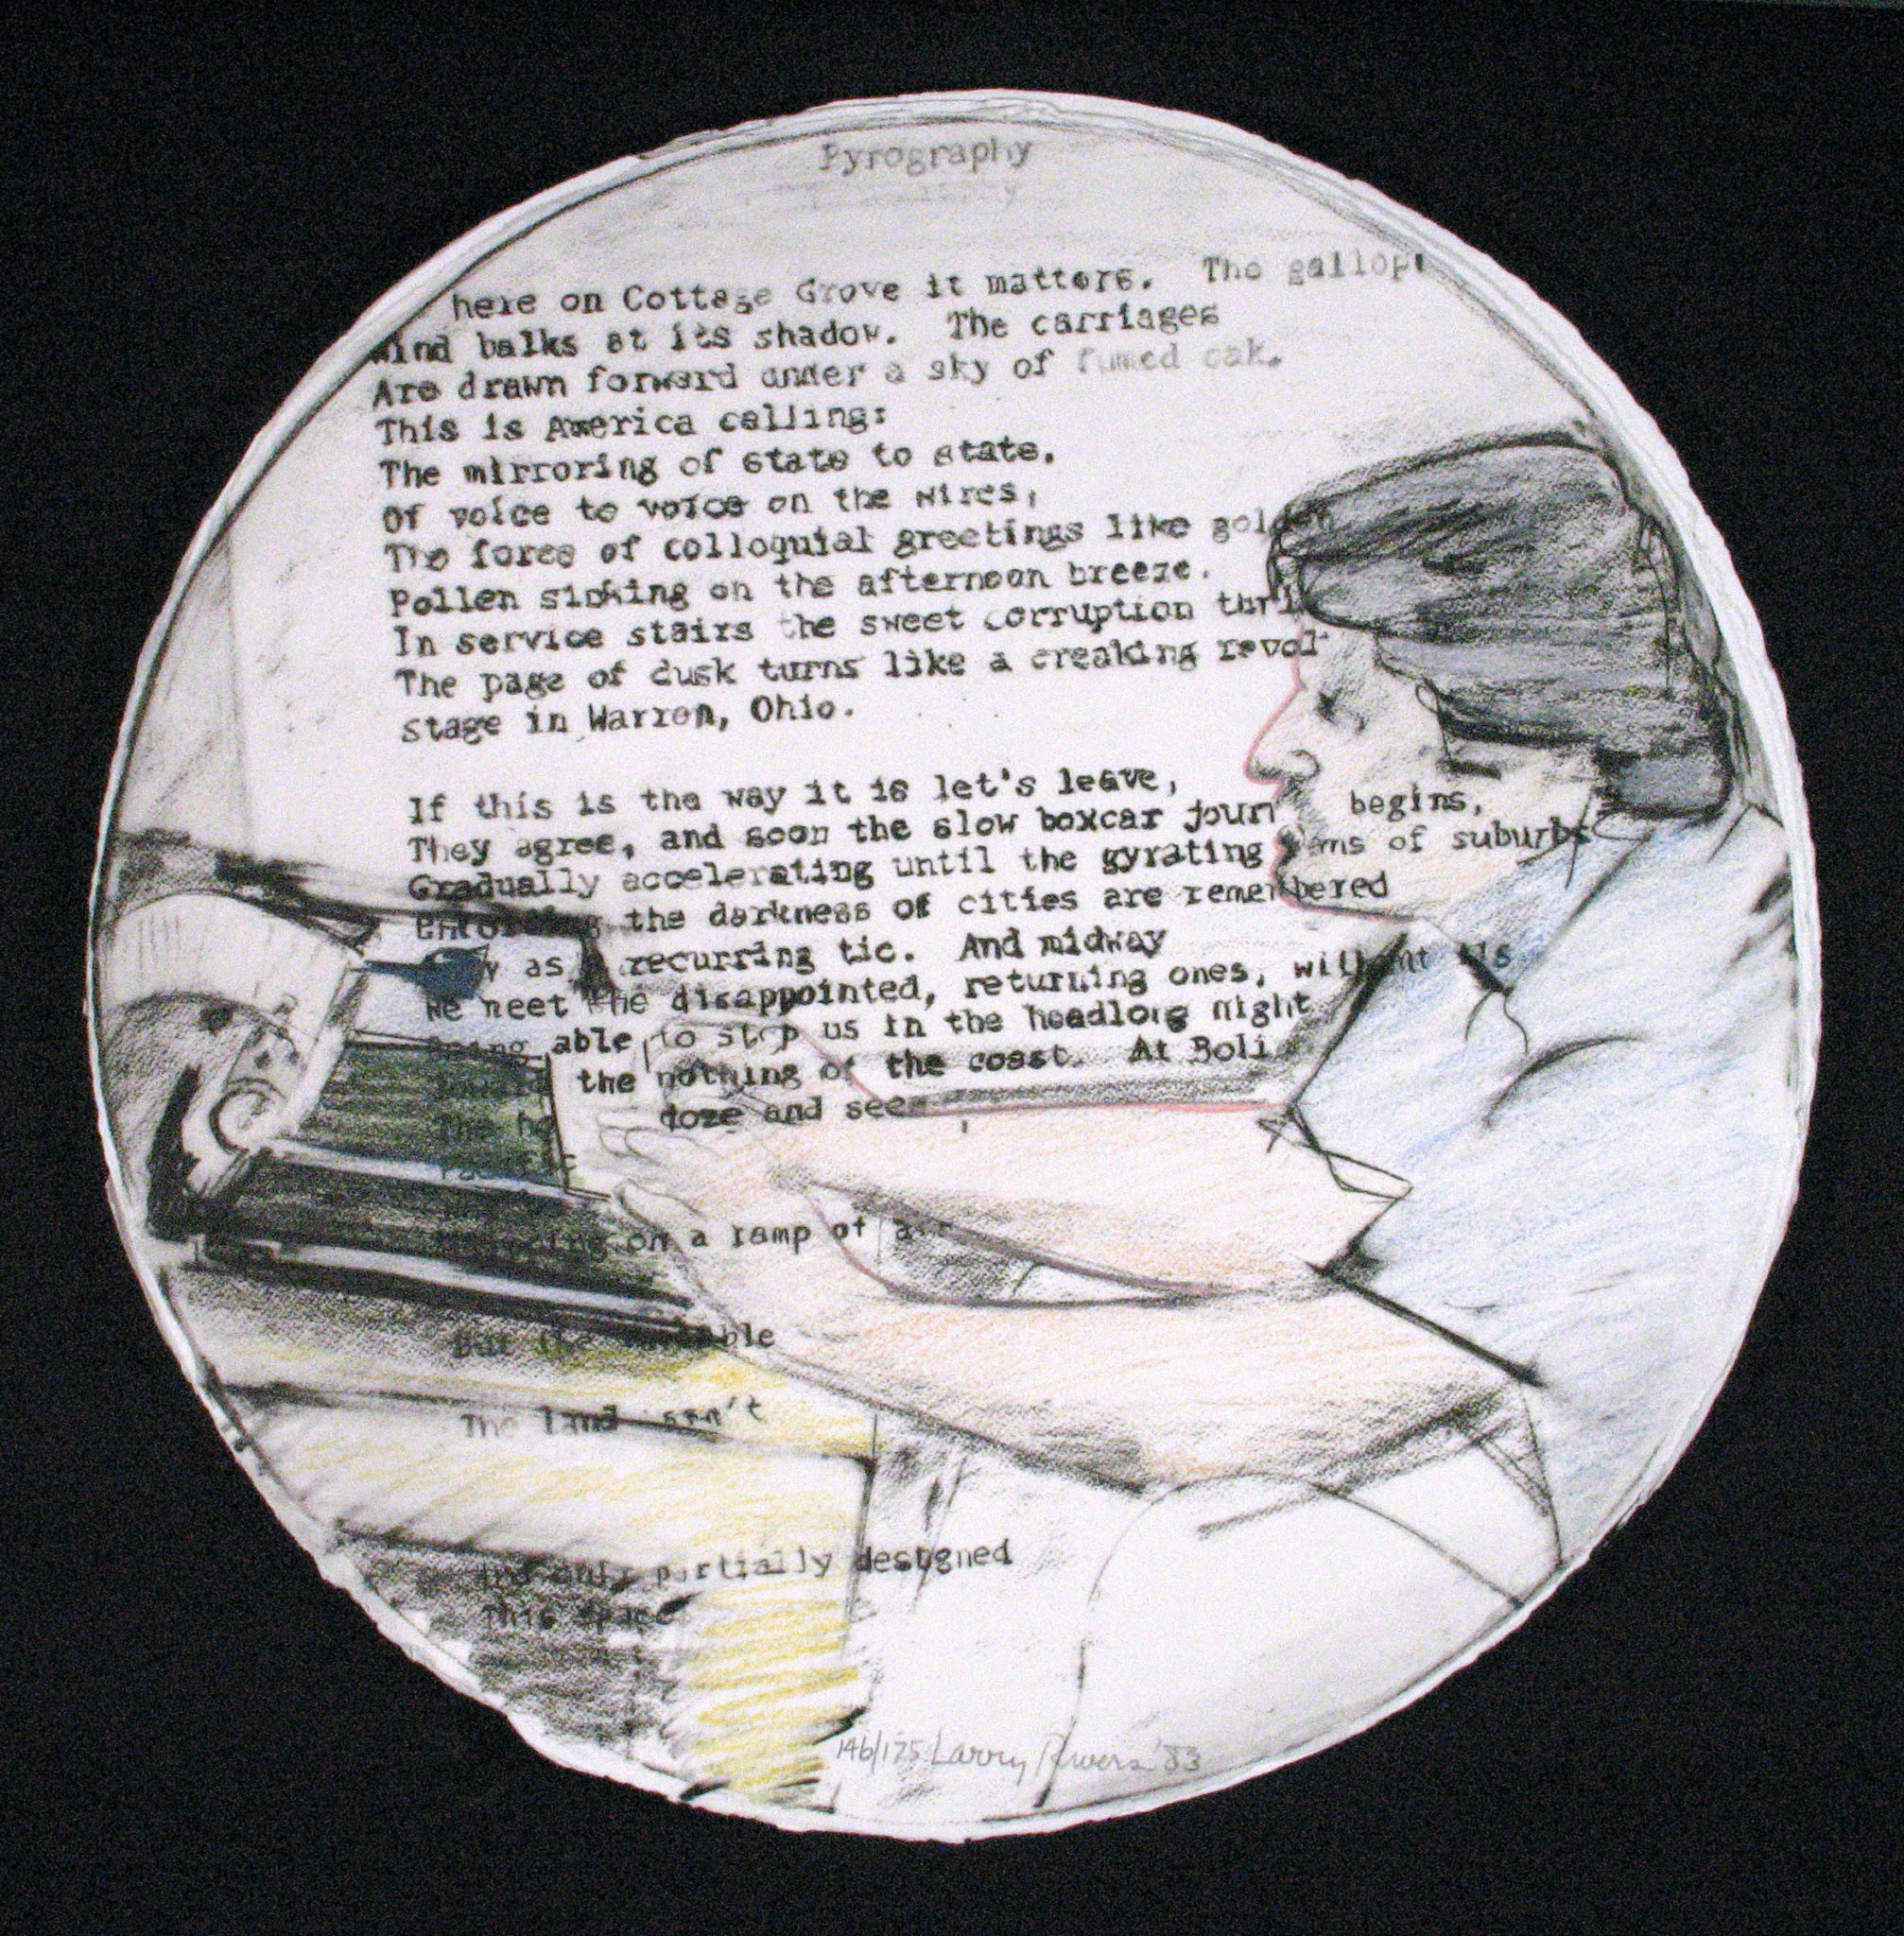 Portrait of John Ashbery at typewriter